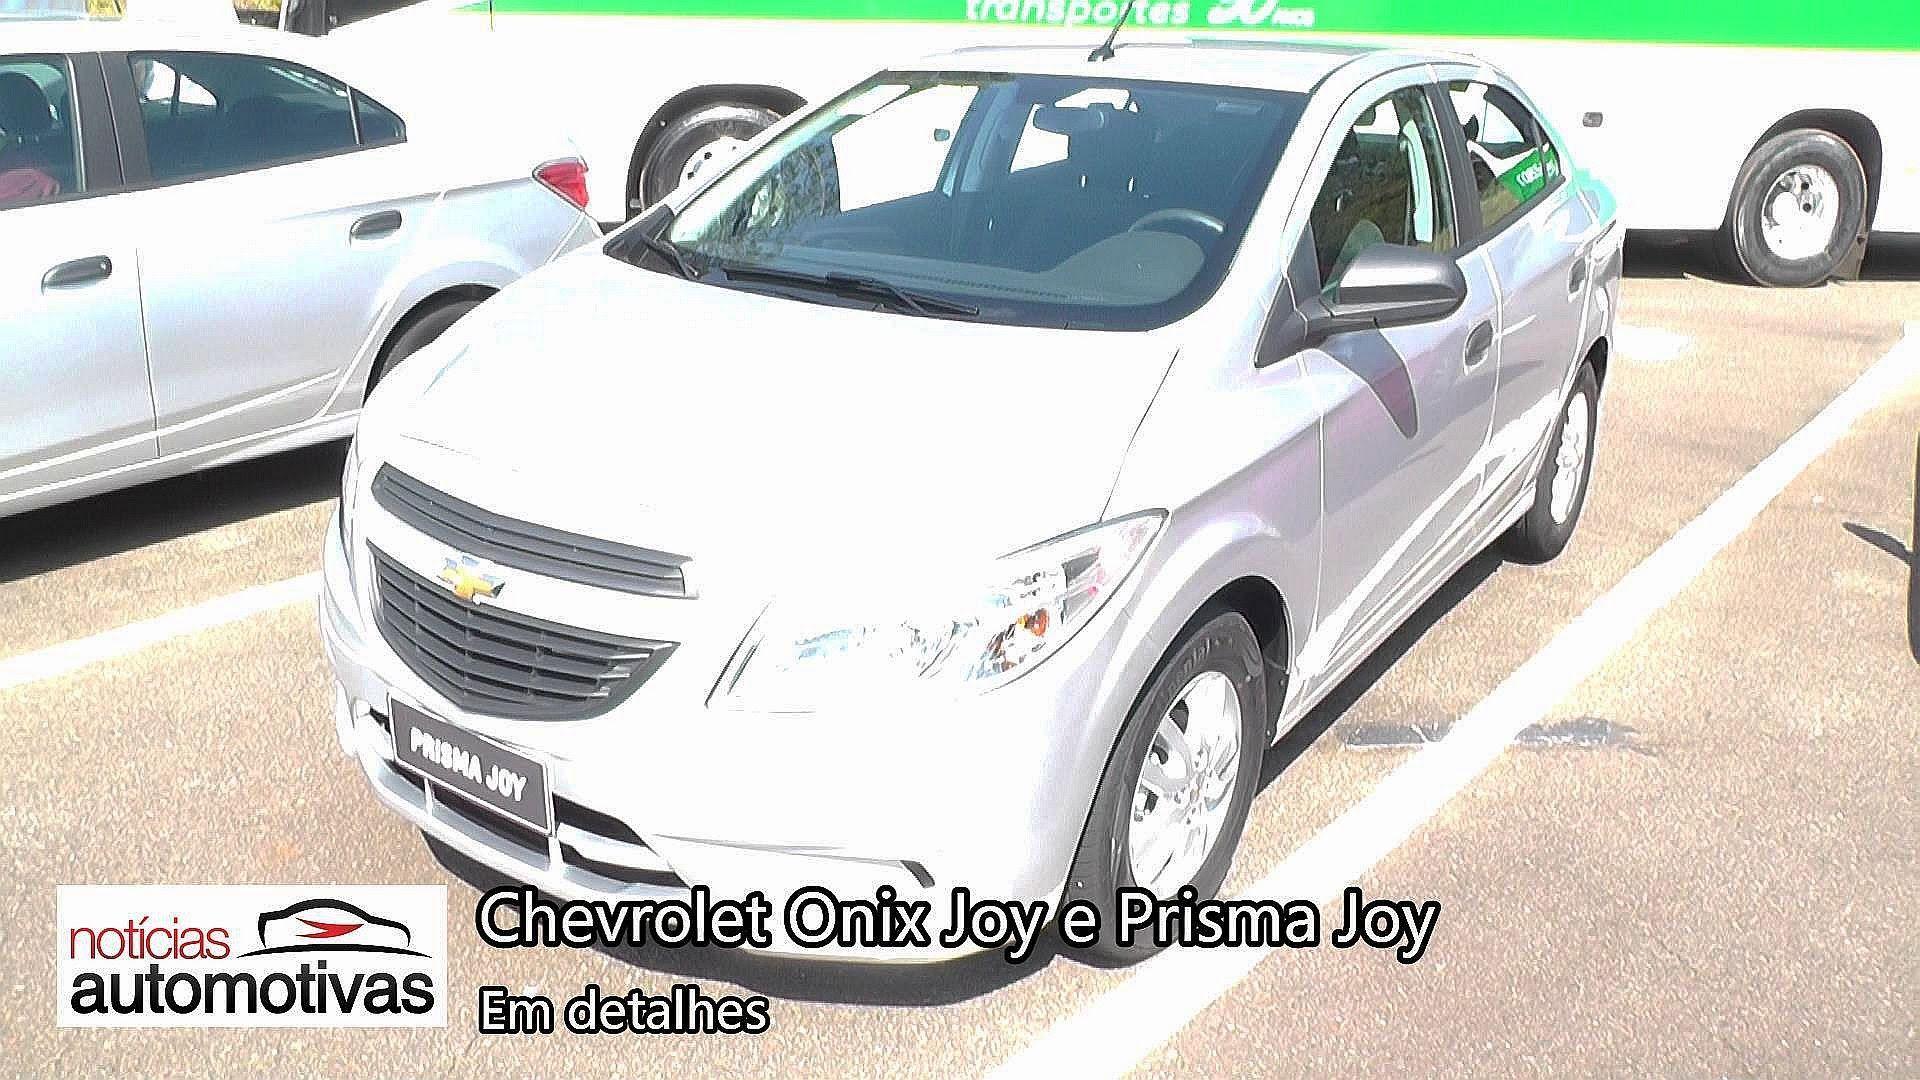 Chevrolet Onix Joy E Prisma Joy Detalhes Noticiasautomotivas